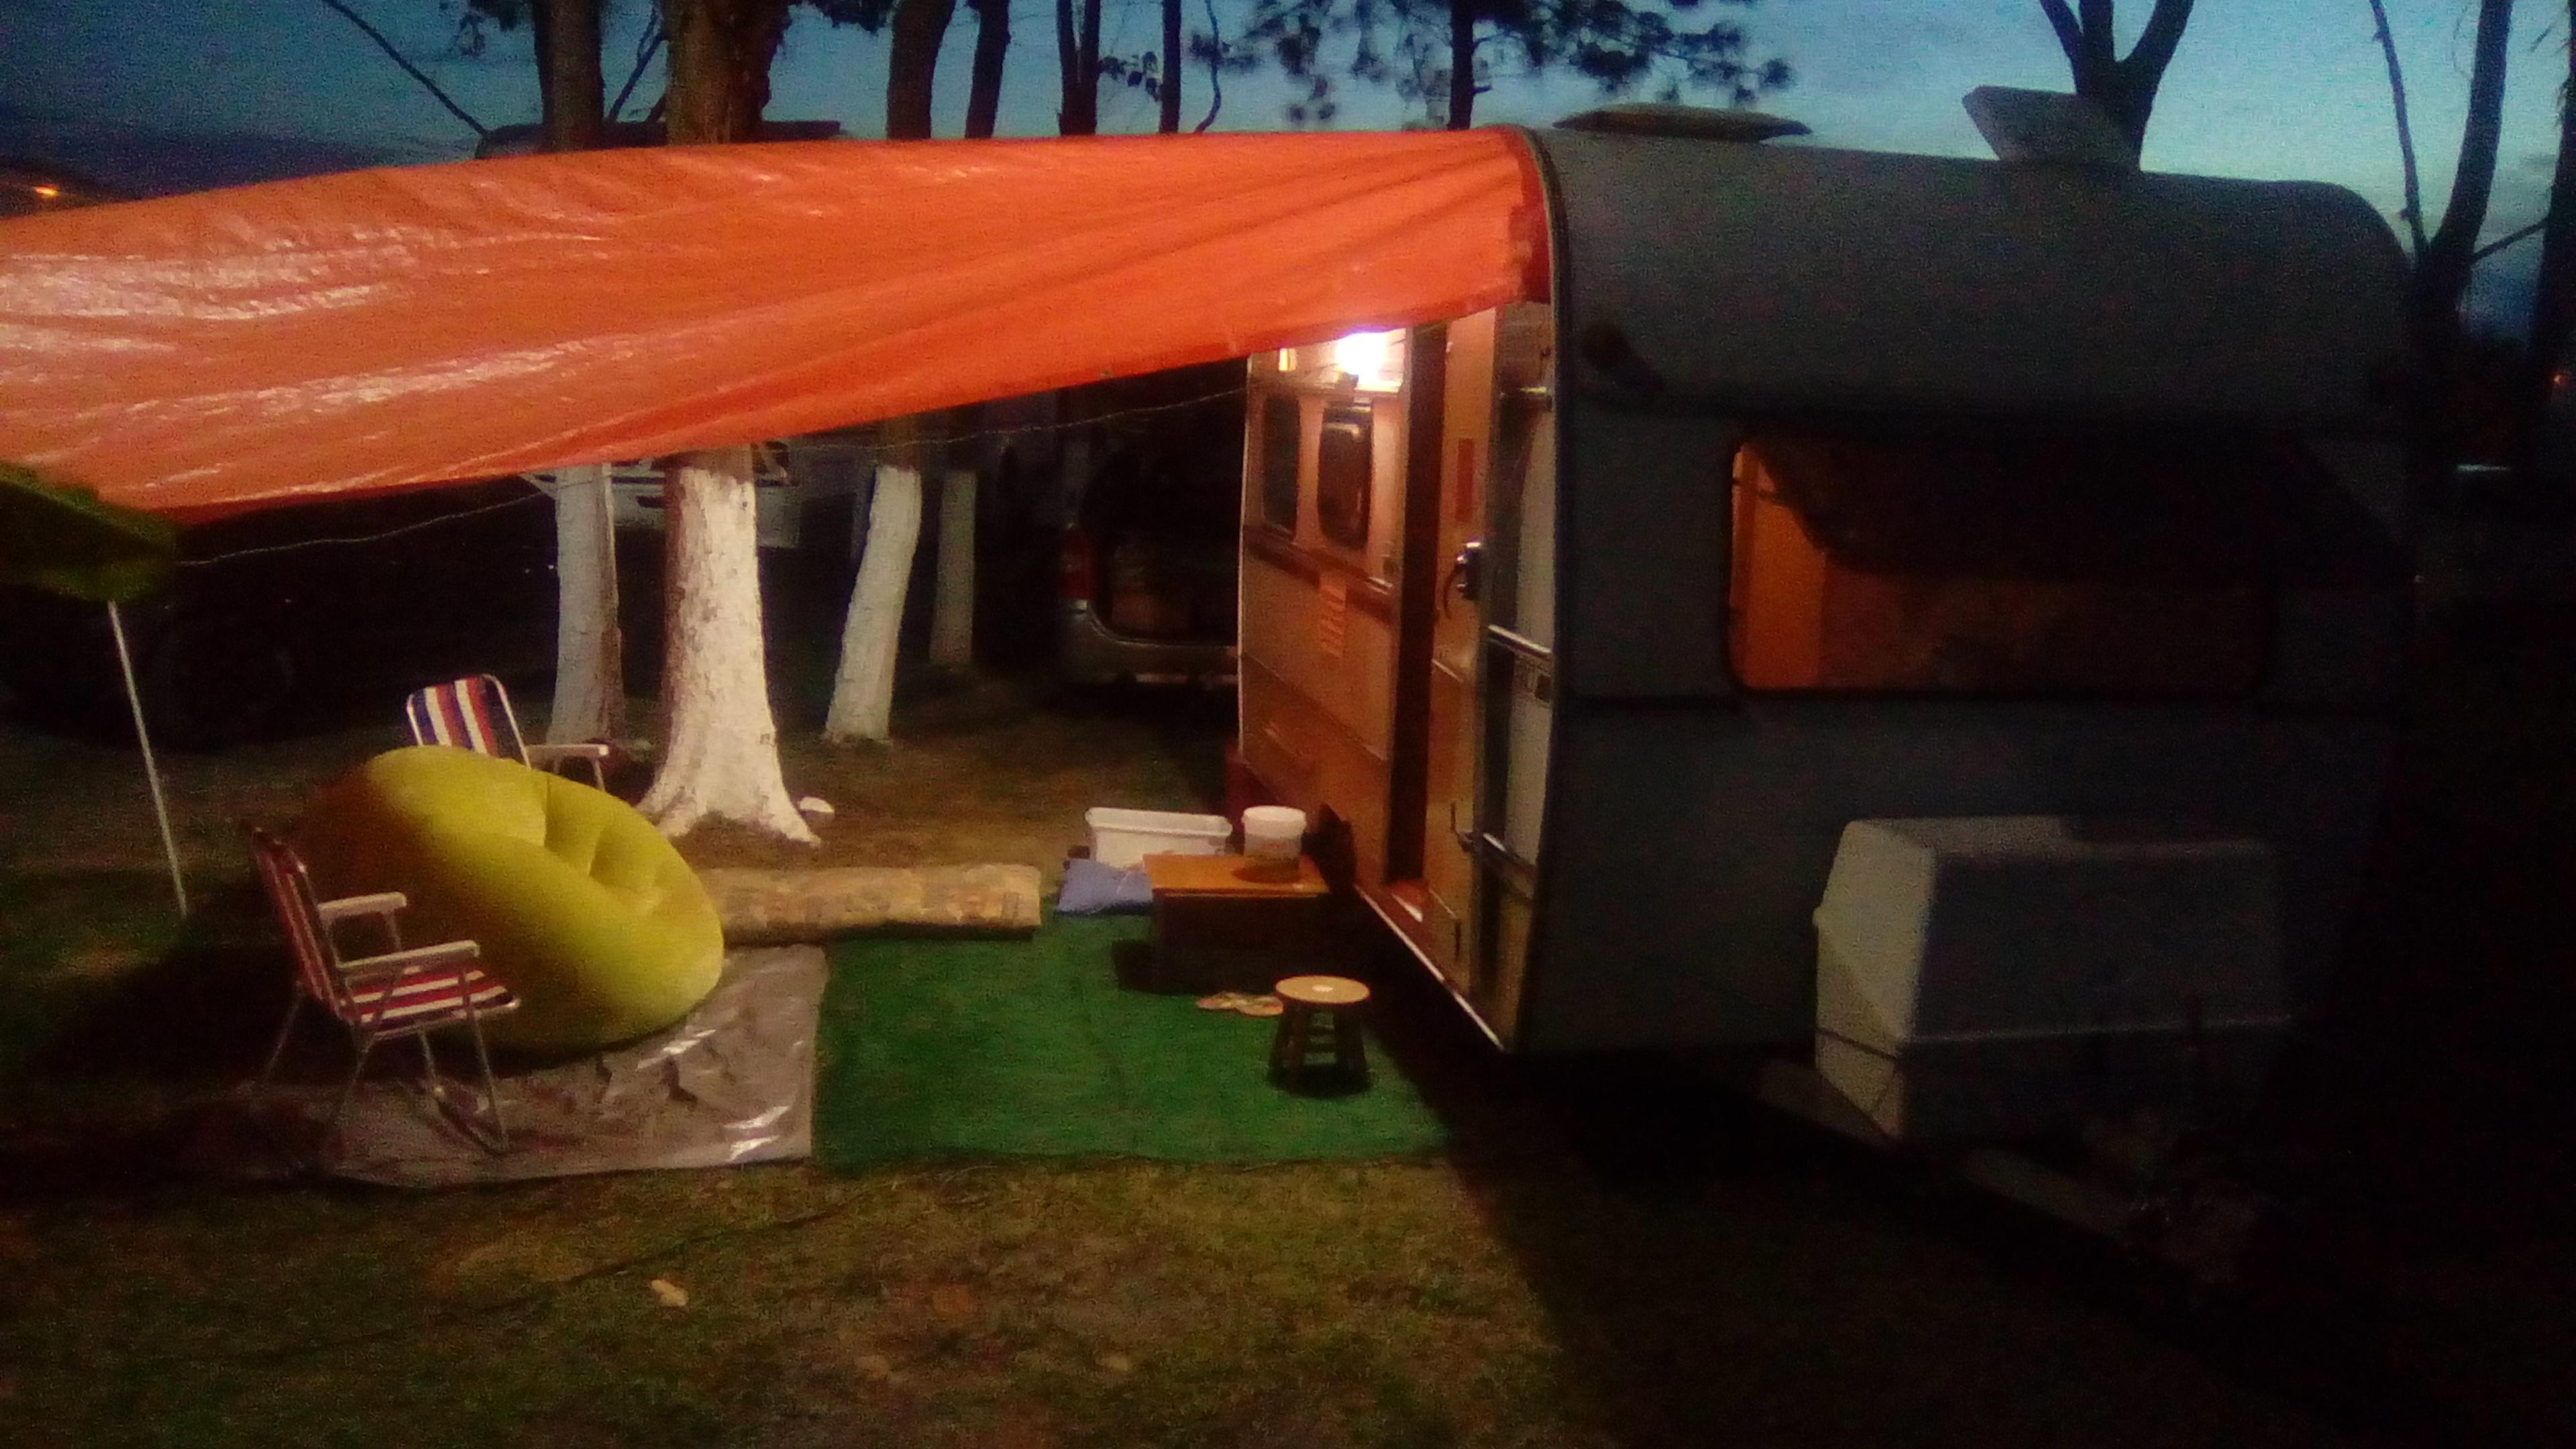 Depois dos perrengues, acampamento montado.